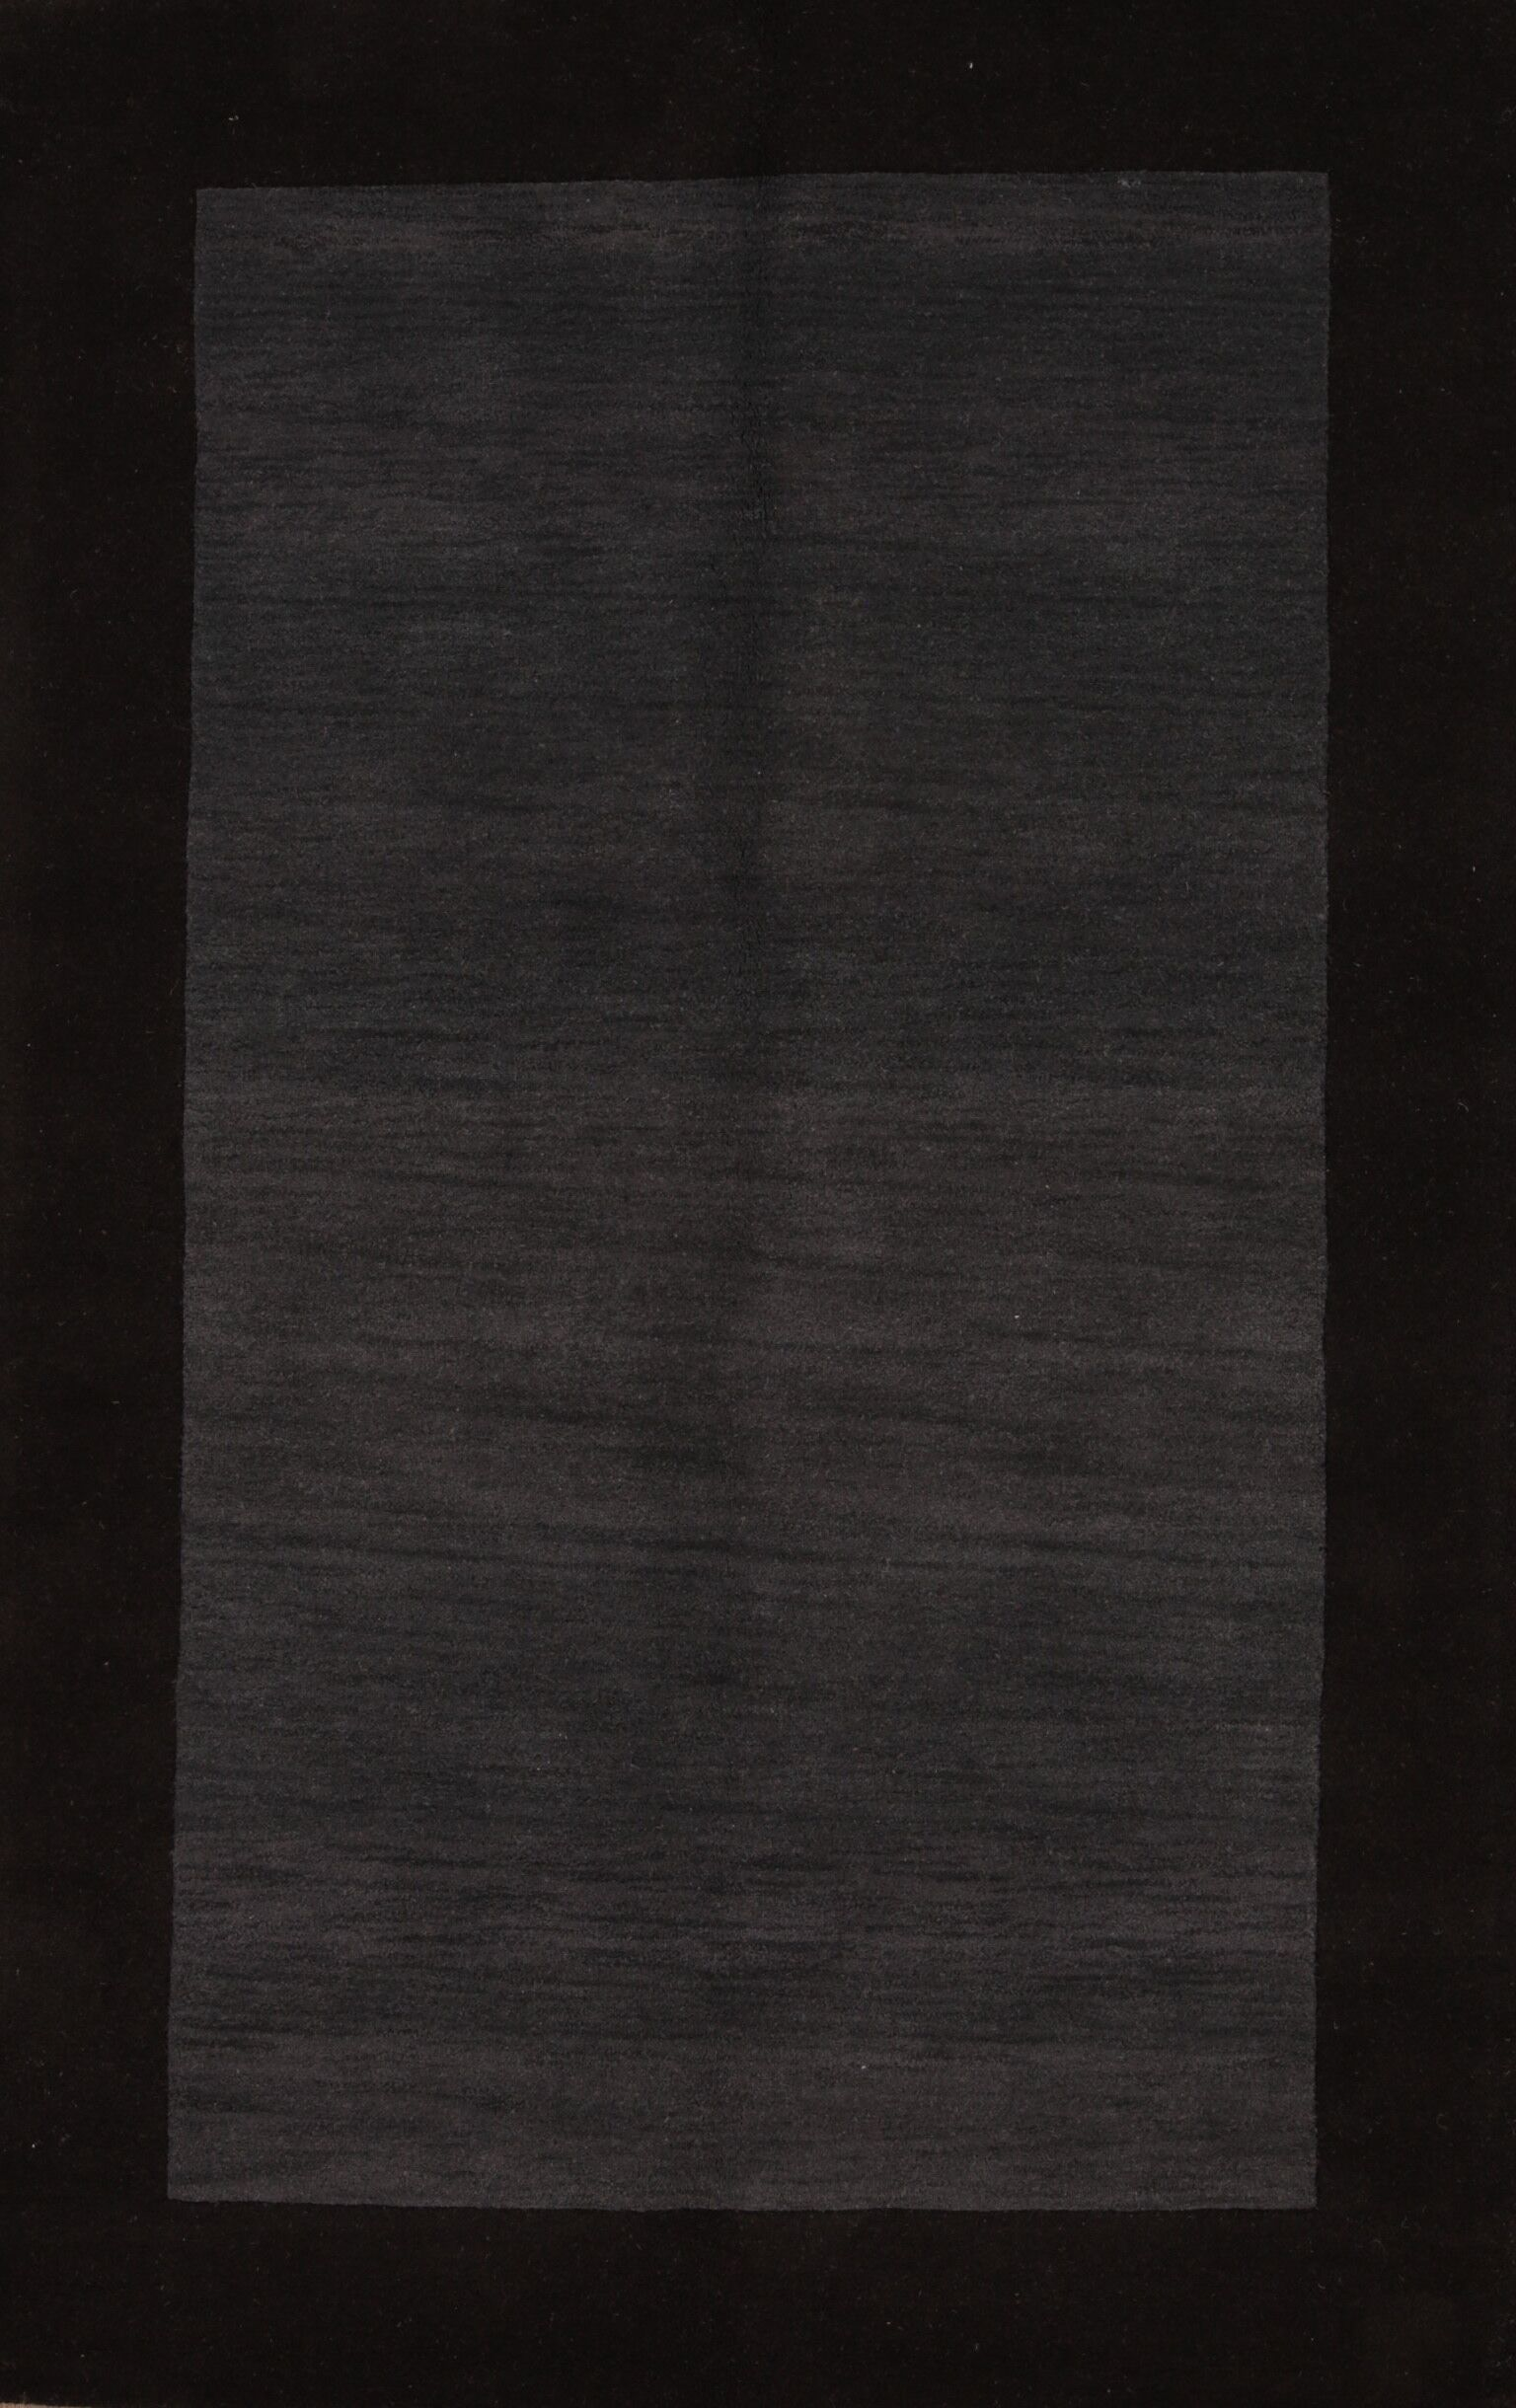 Seidman Oushak Oriental Hand-Tufted Wool Black Area Rug